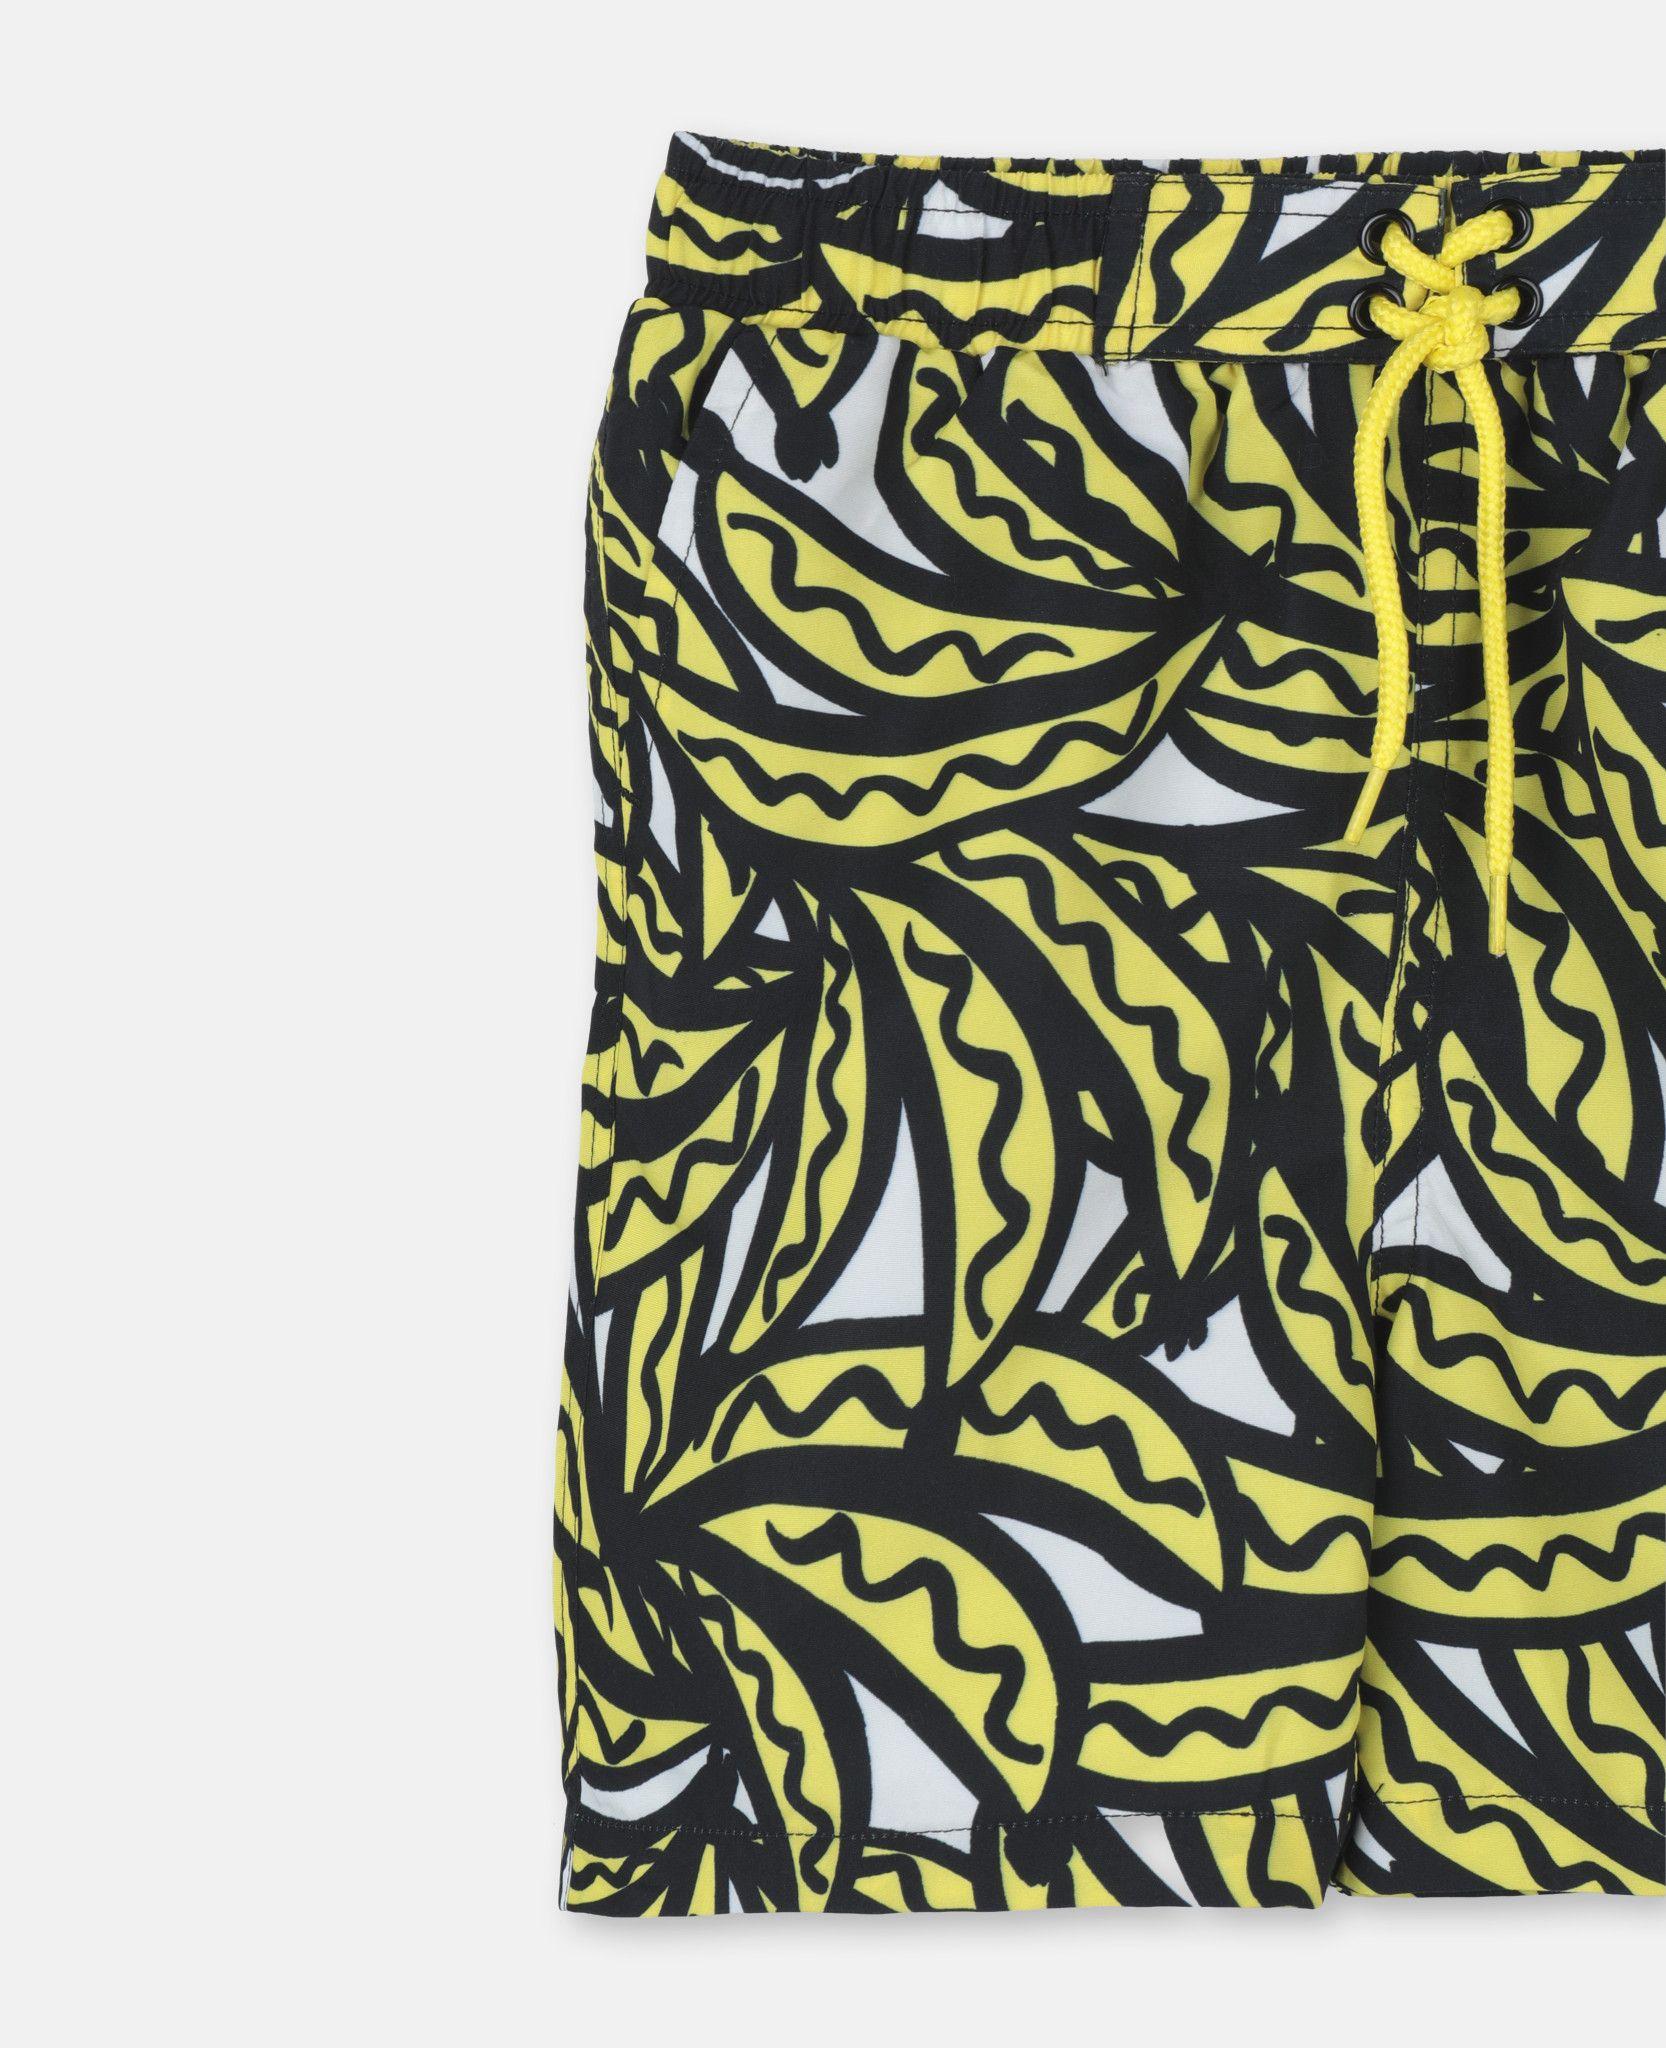 508ec2cbffce7 Bananas Print Swim Shorts - STELLA MCCARTNEY KIDS | Living Fabulous ...